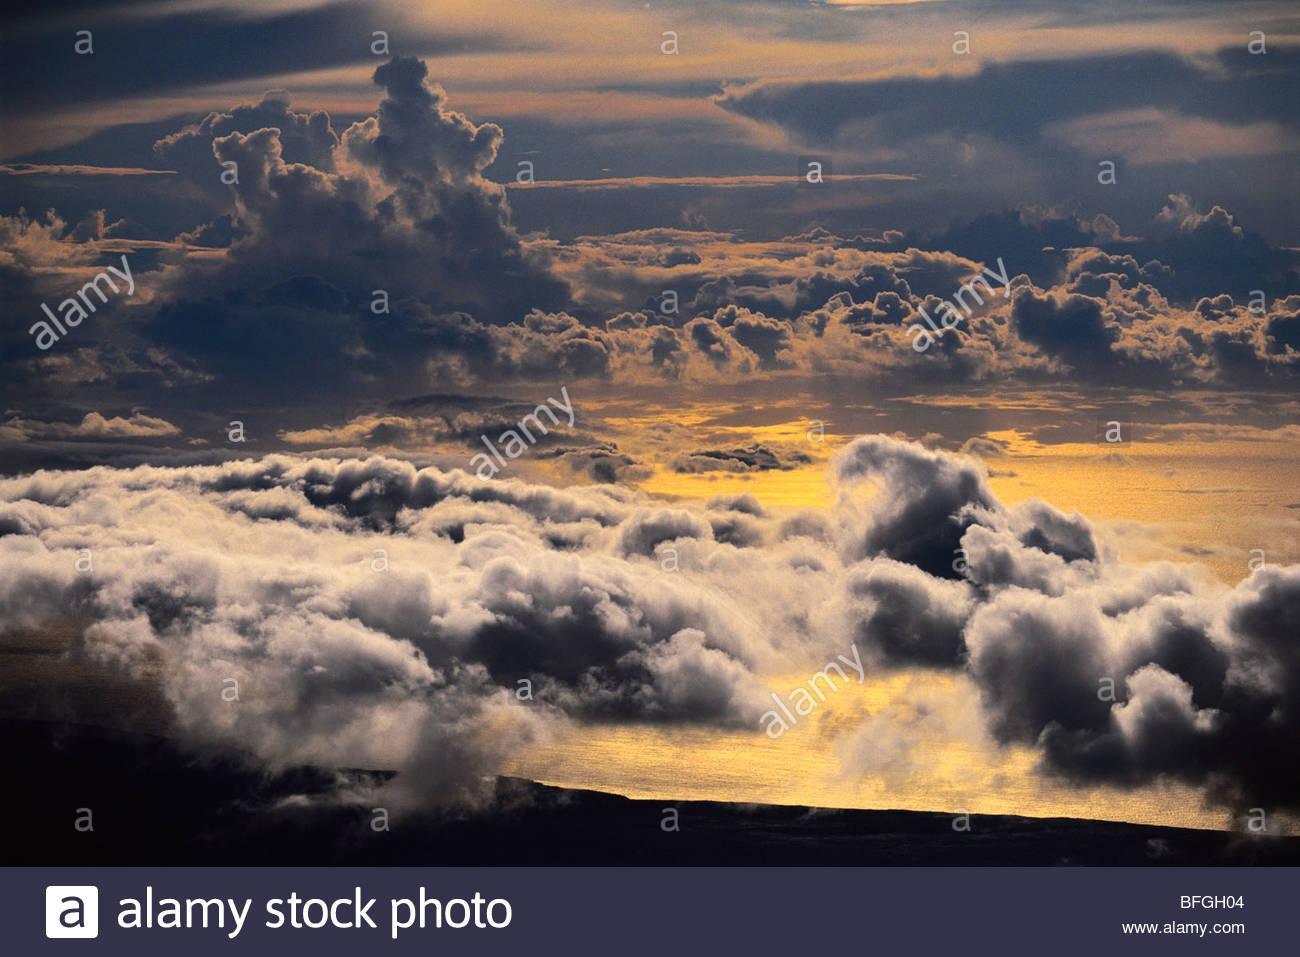 Stormclouds (aerial), Hawaii Volcanoes National Park, Hawaii - Stock Image